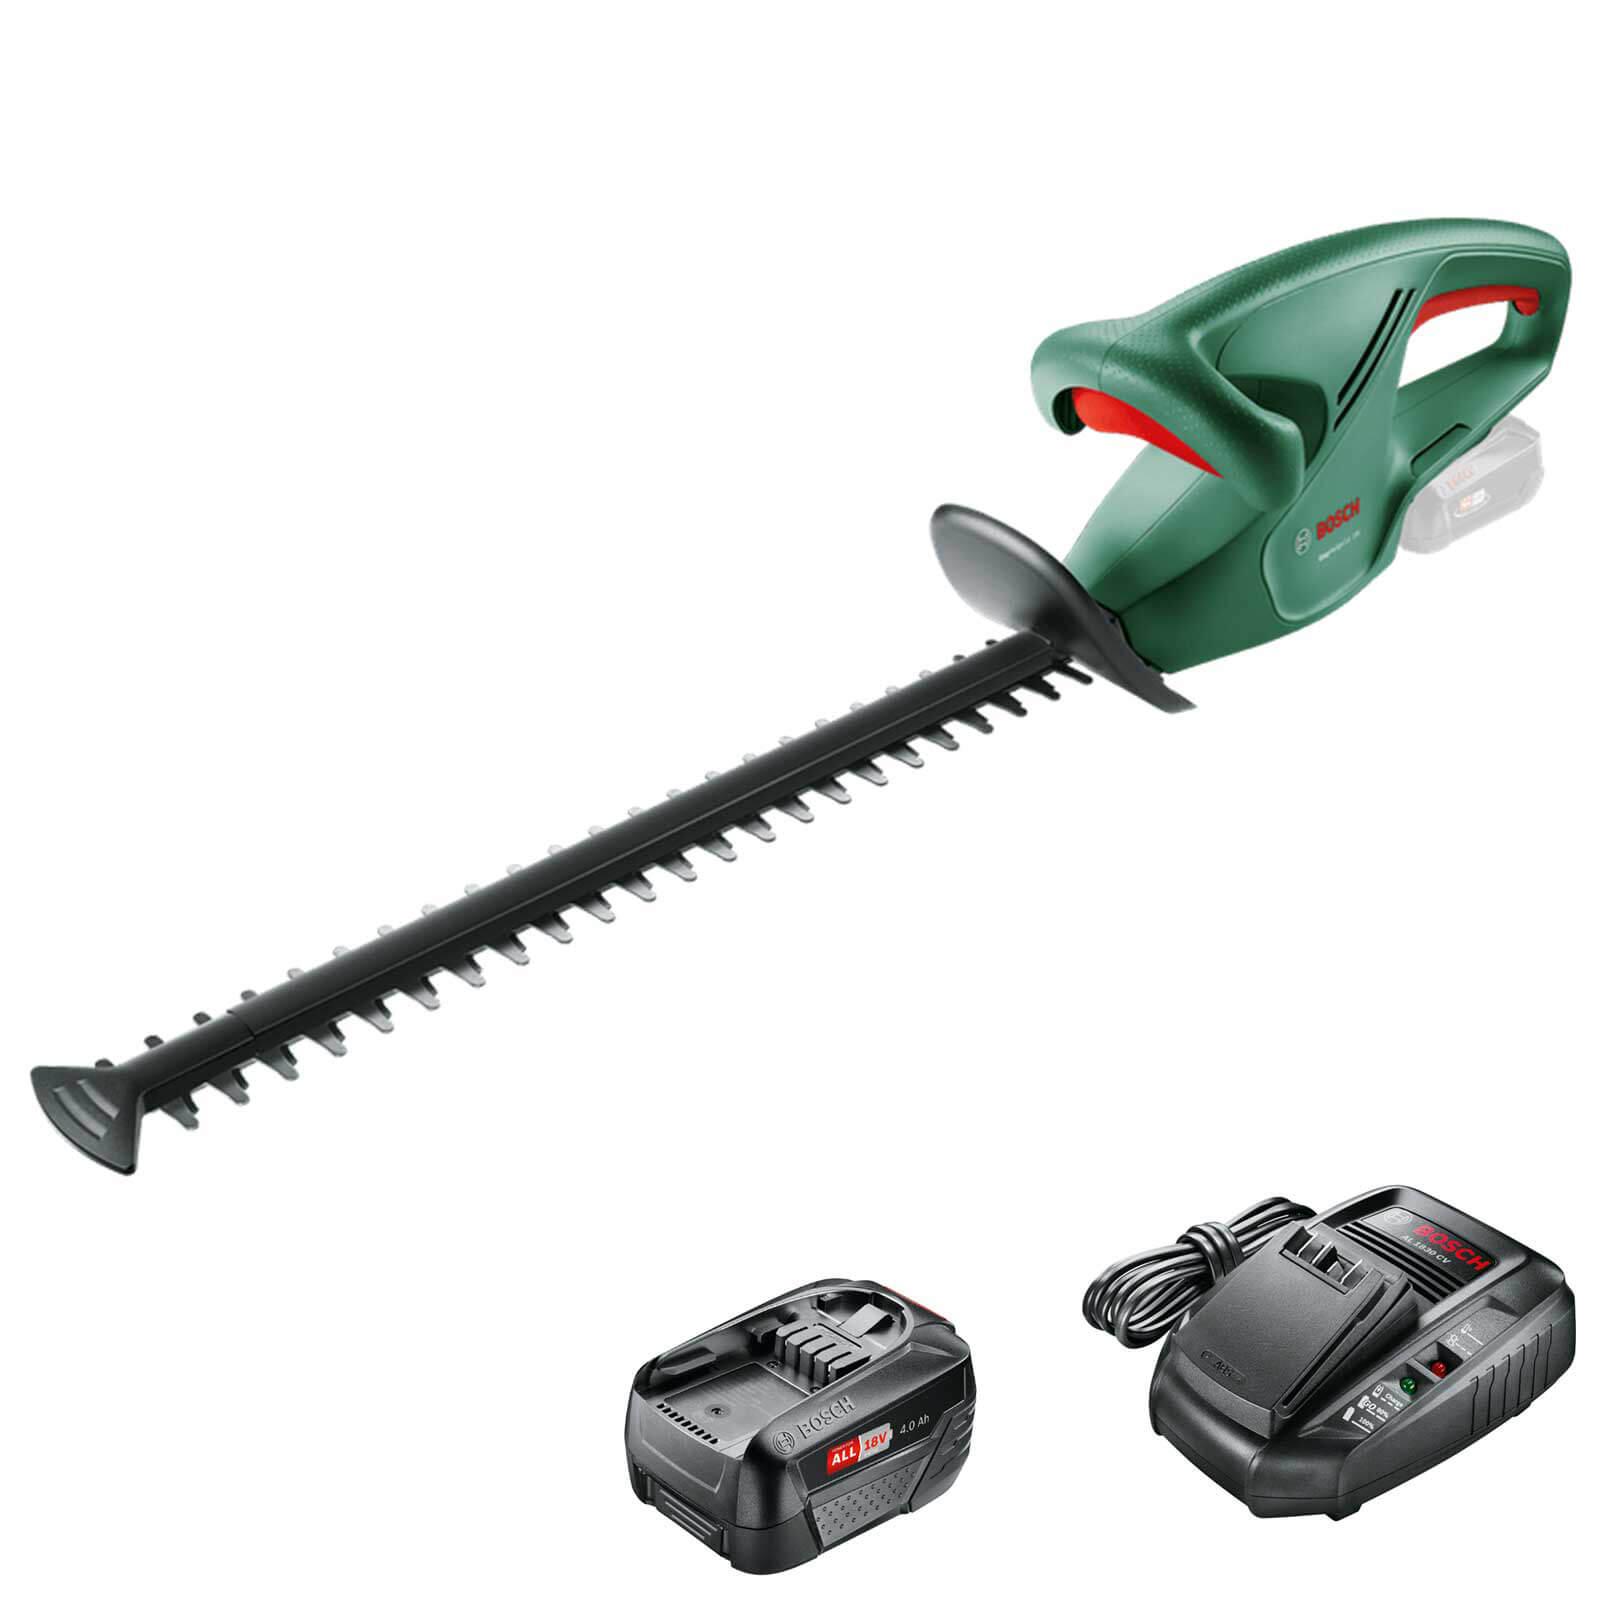 Bosch EASYHEDGECUT 18-45 18v Cordless Hedge Trimmer 450mm 1 x 4ah Li-ion Charger